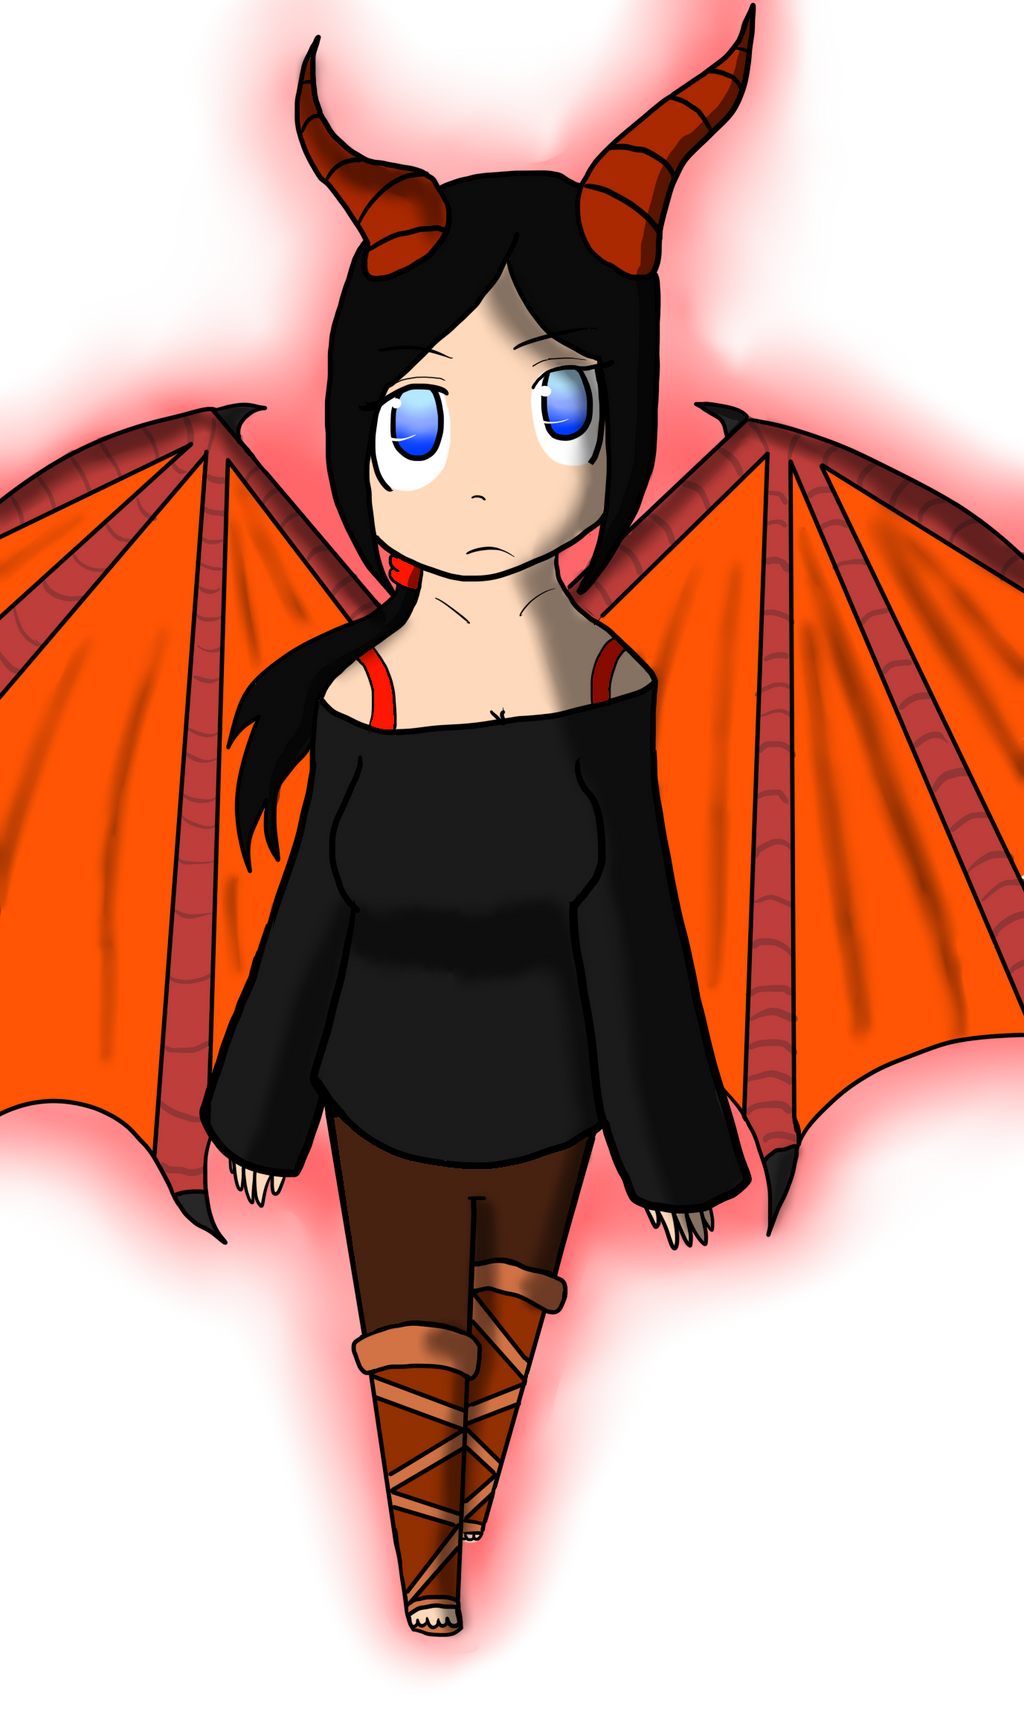 Wings Of Fire Peril Gijinka By Minish Mae On DeviantArt